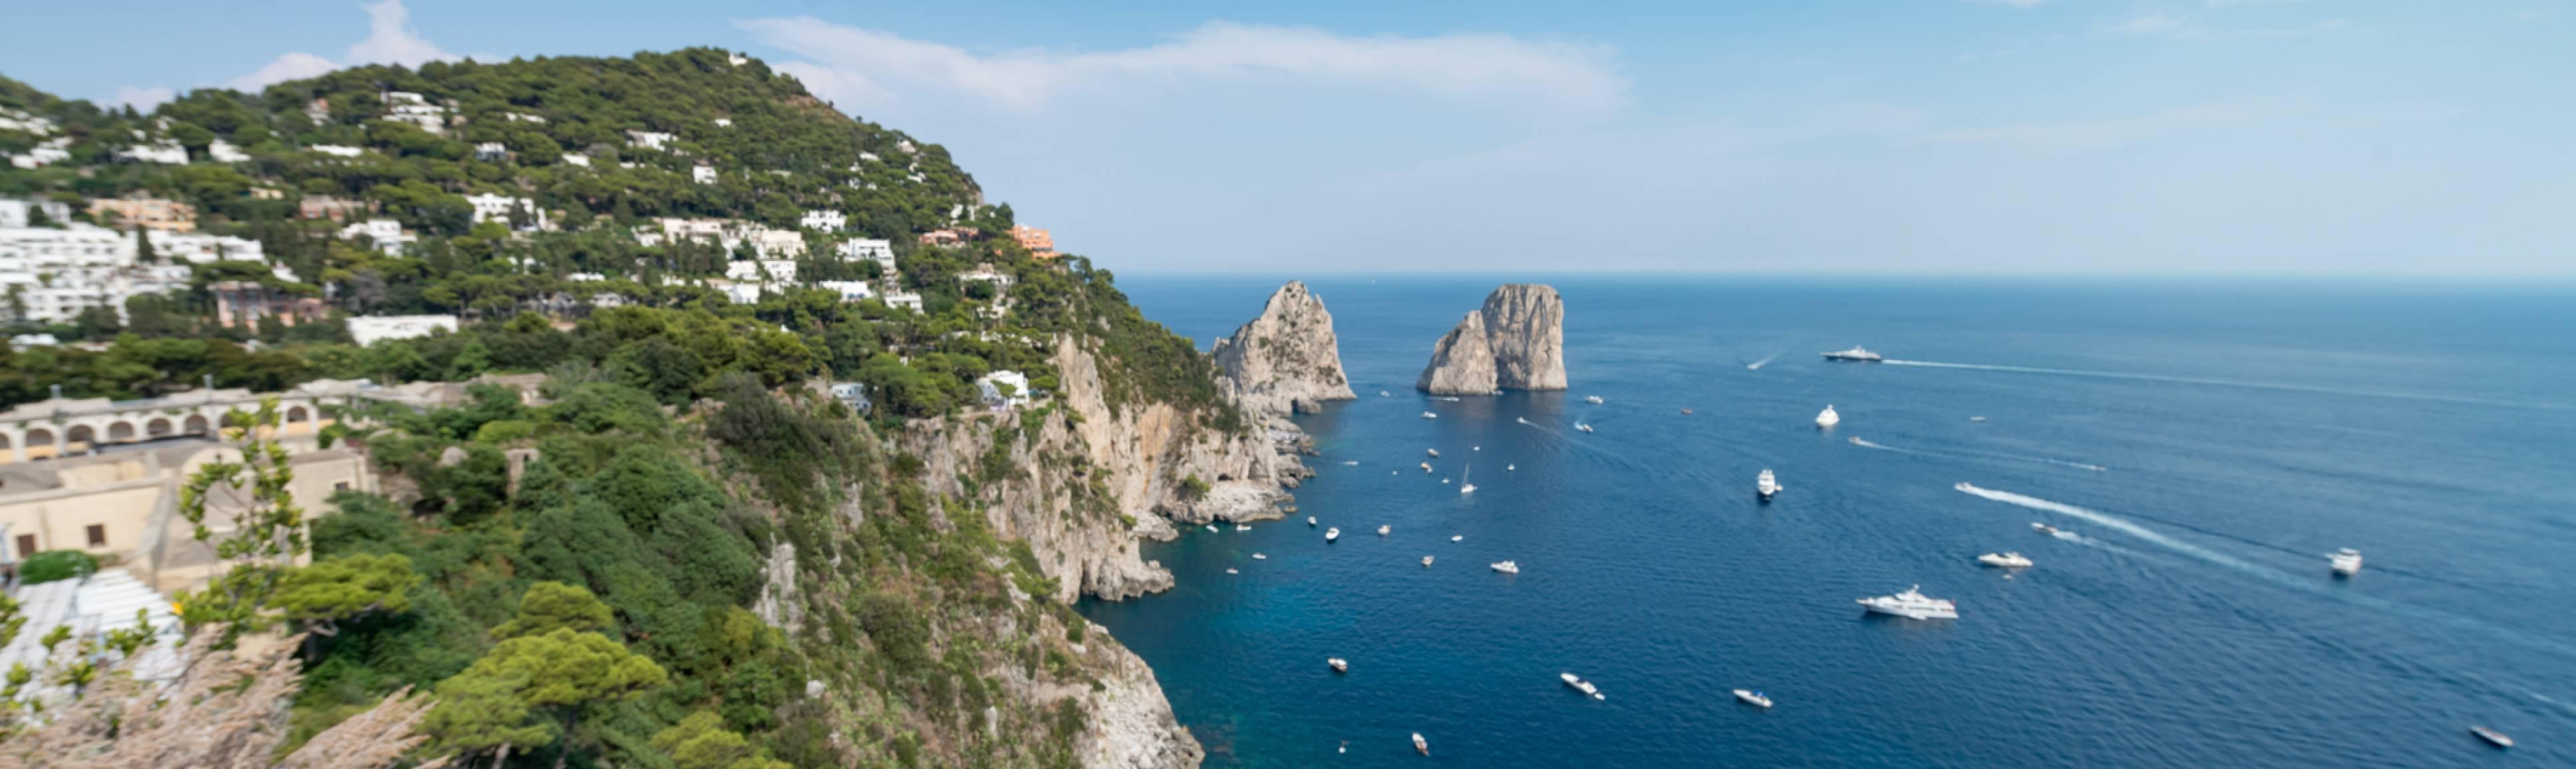 Looking down at th water along the Amalfi Coast, Italy